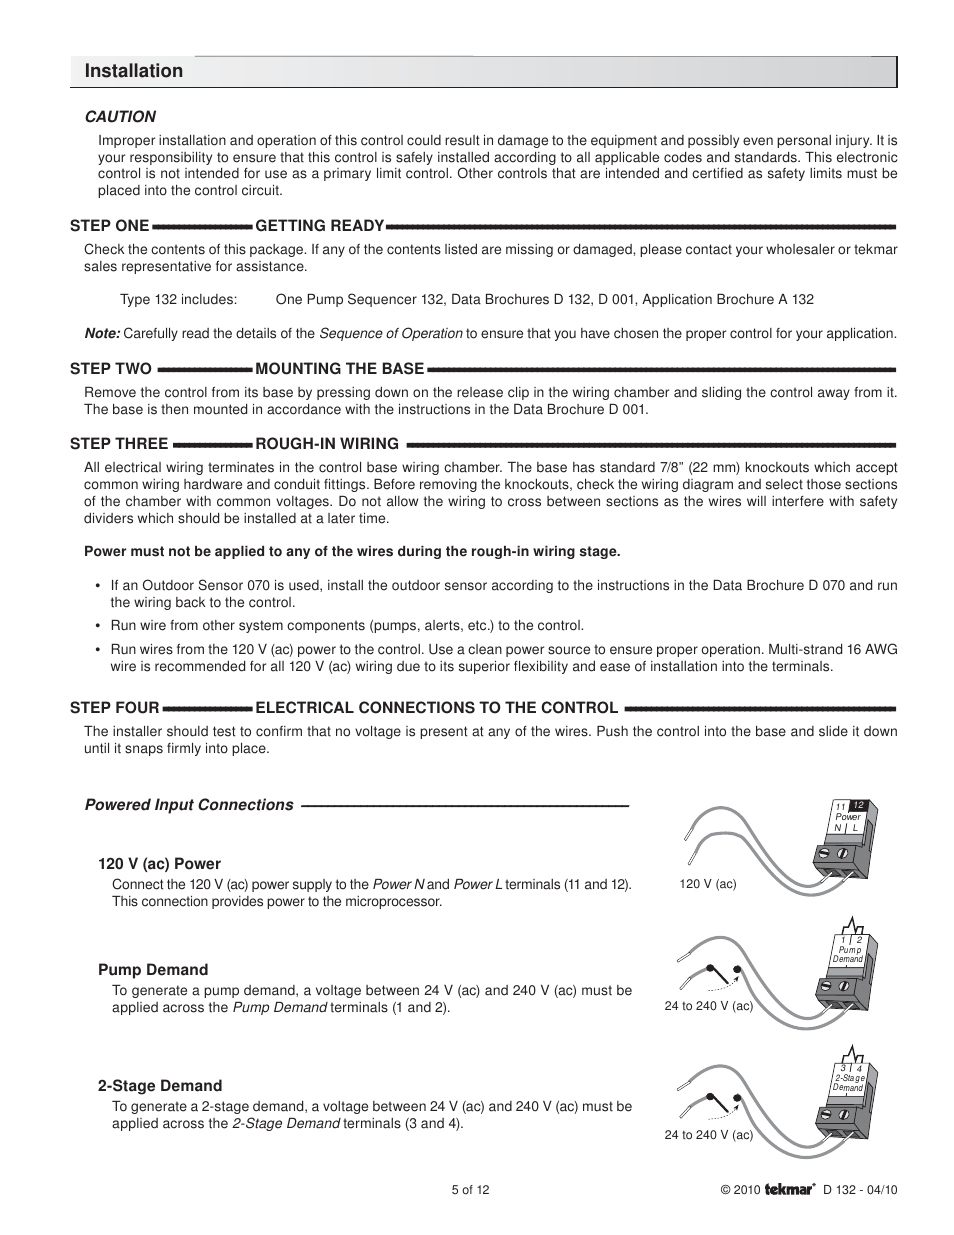 diagram labeled dubhehr data wiring diagram rh thai massage sawasdee de